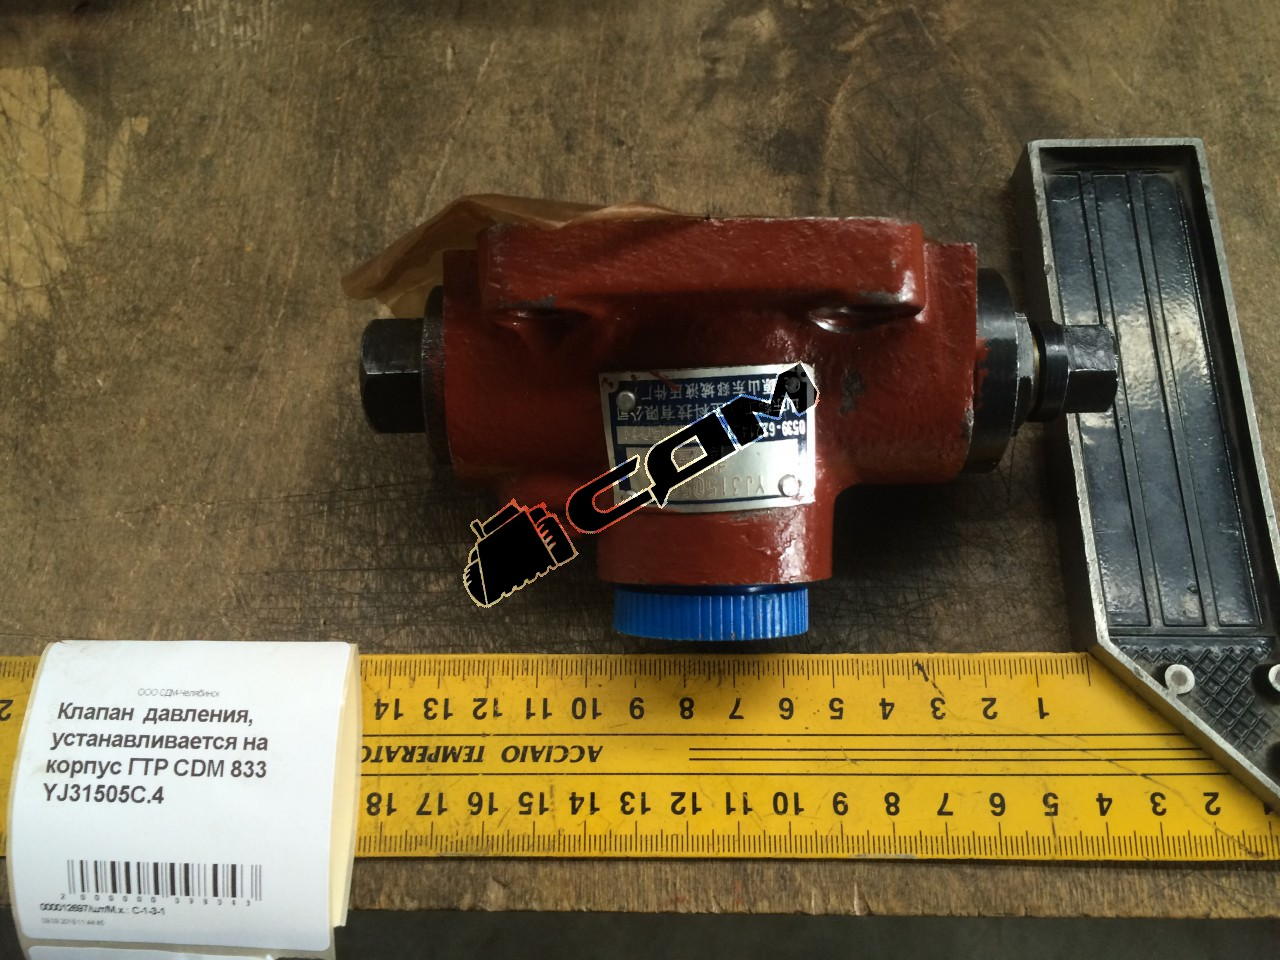 Клапан  давления, устанавливается на корпус ГТР CDM 833  YJ31505C.4